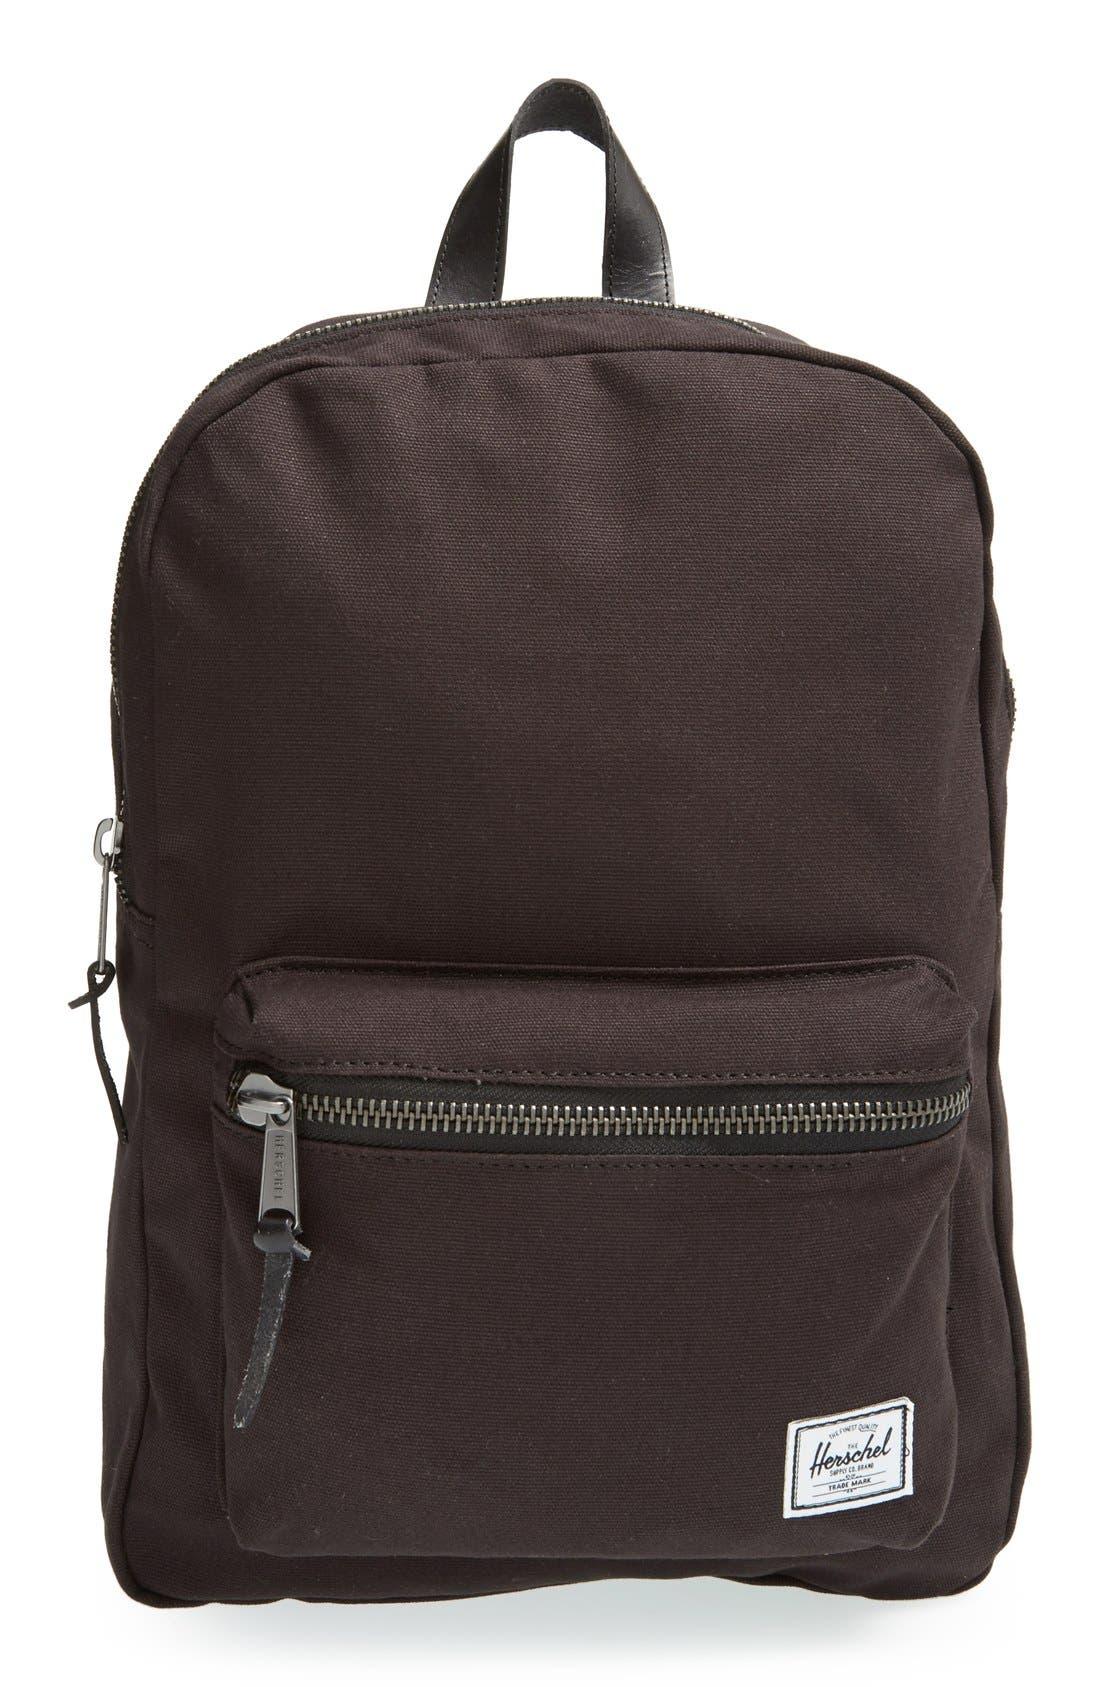 Alternate Image 1 Selected - Herschel Supply Co. 'Settlement Select- Mid Volume' Backpack